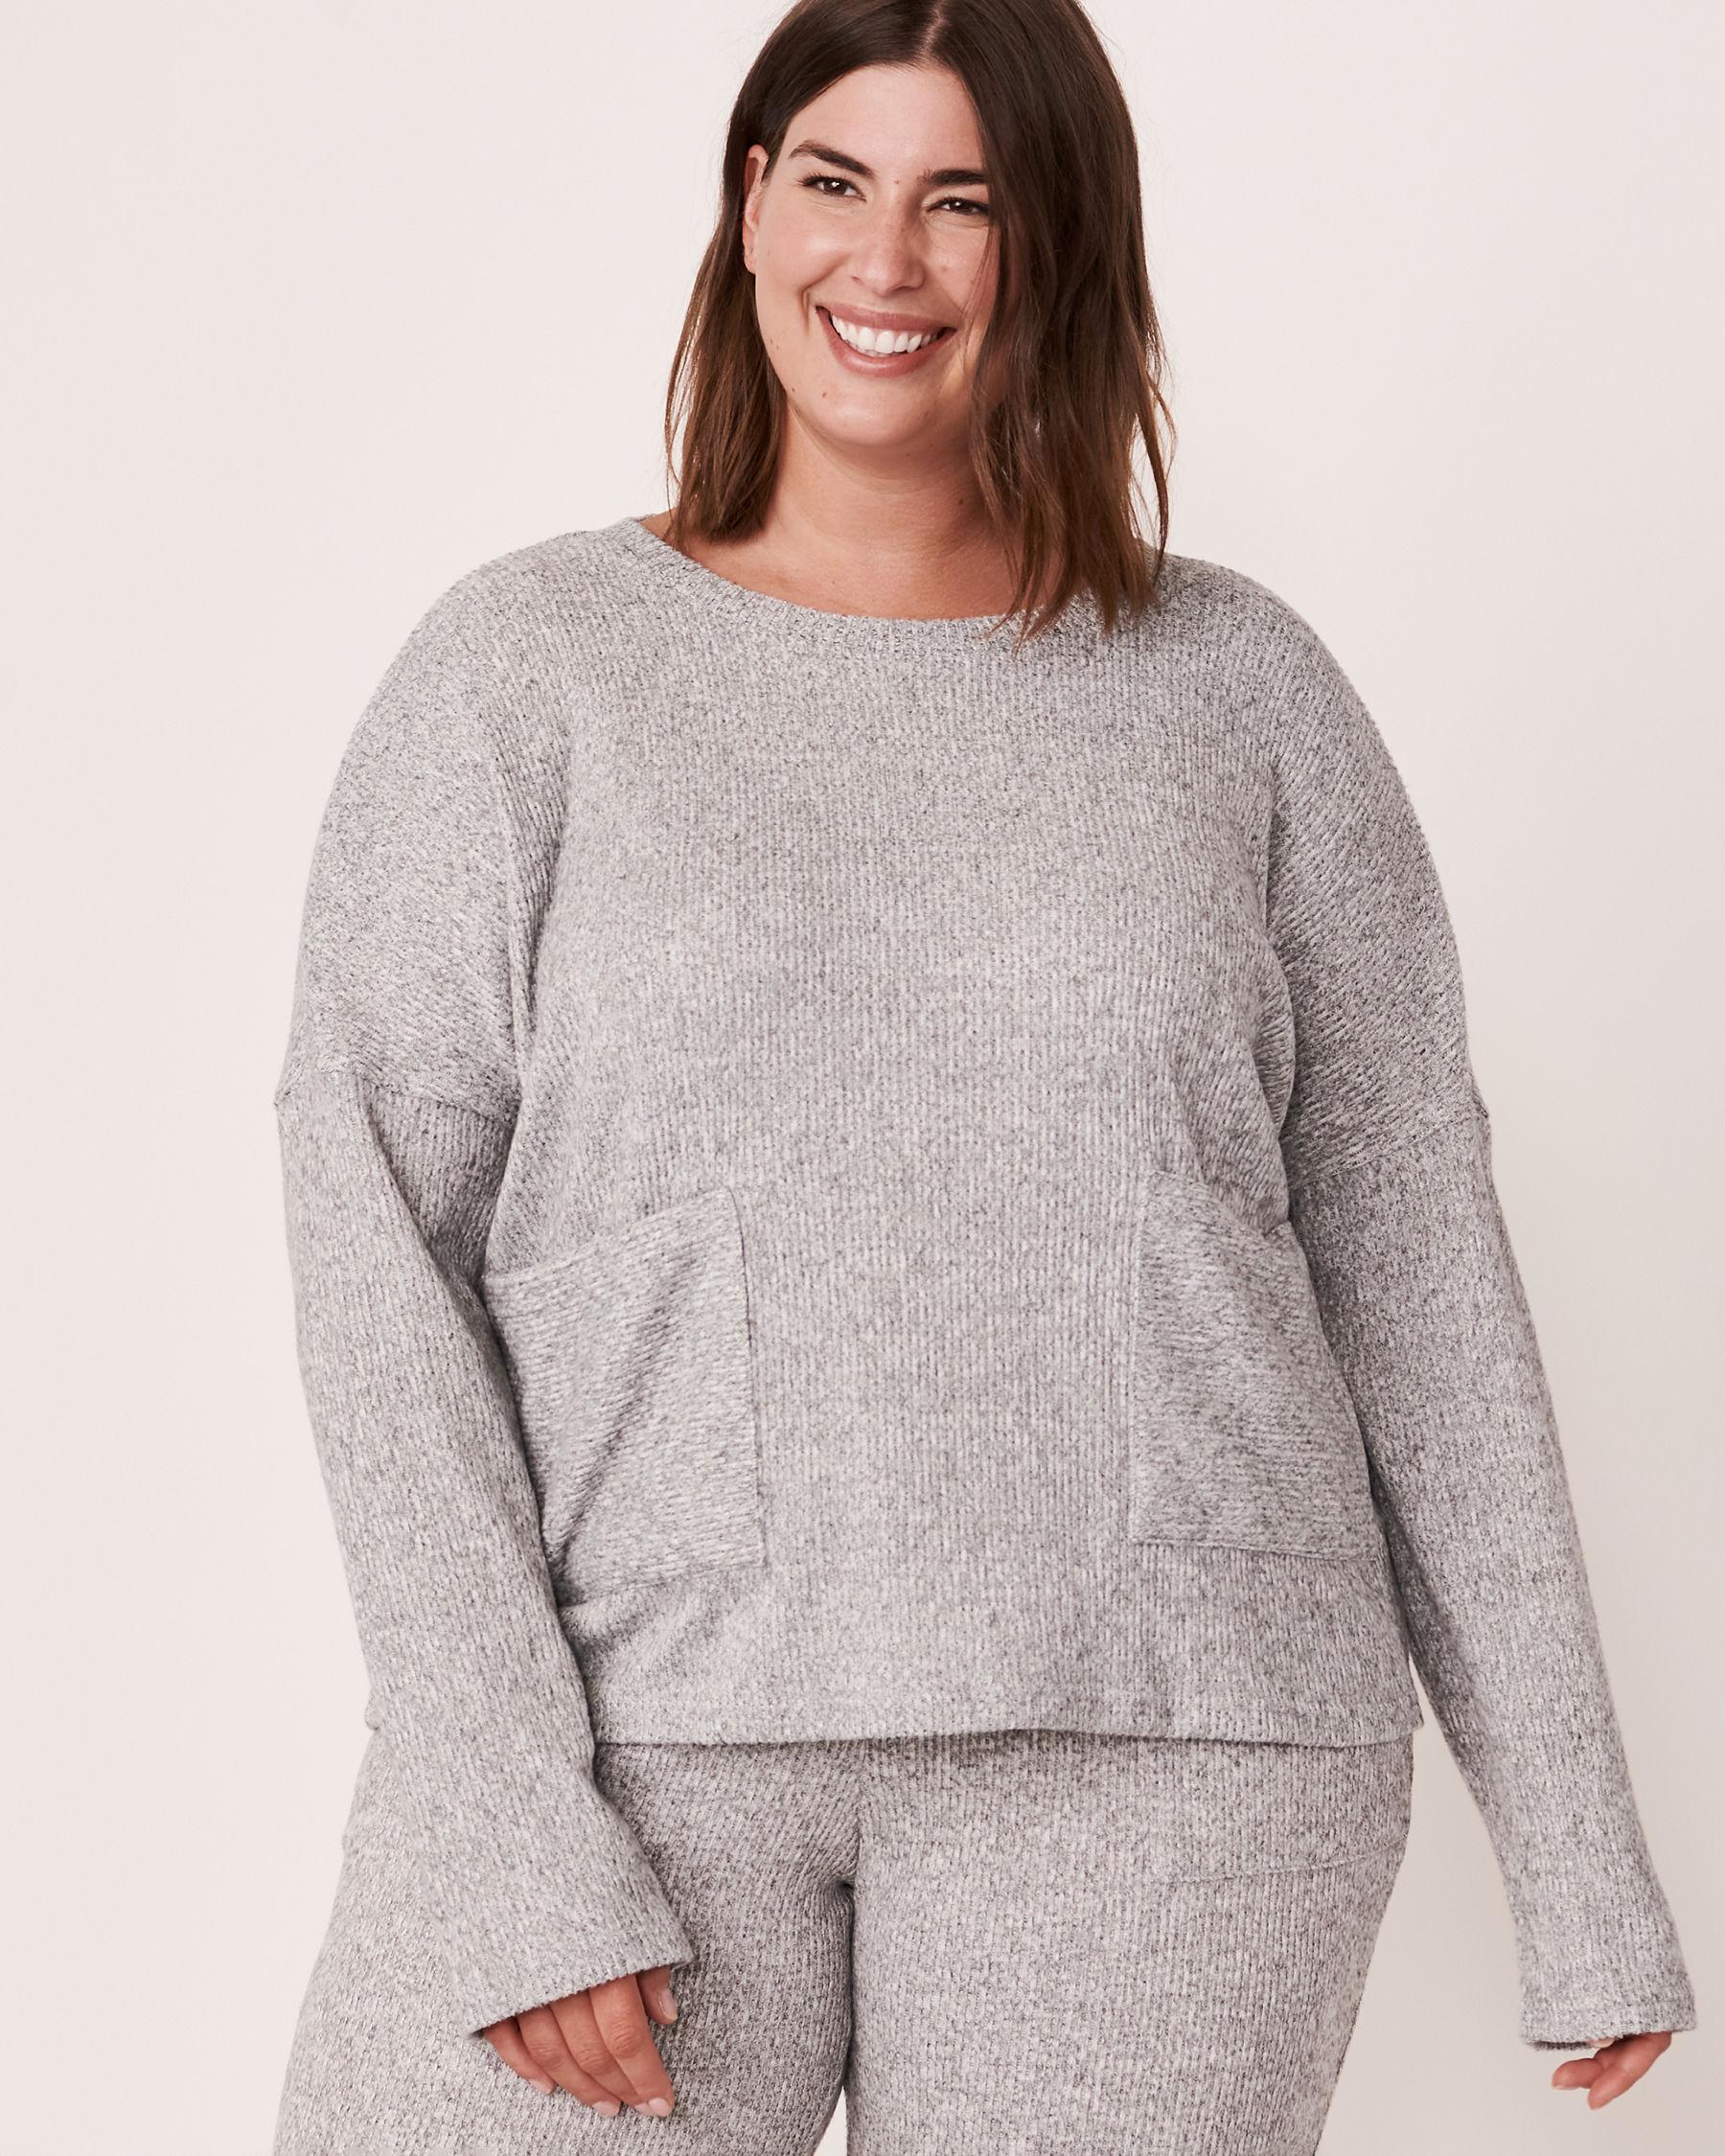 LA VIE EN ROSE Ribbed Long Sleeve Shirt Grey 50100015 - View1